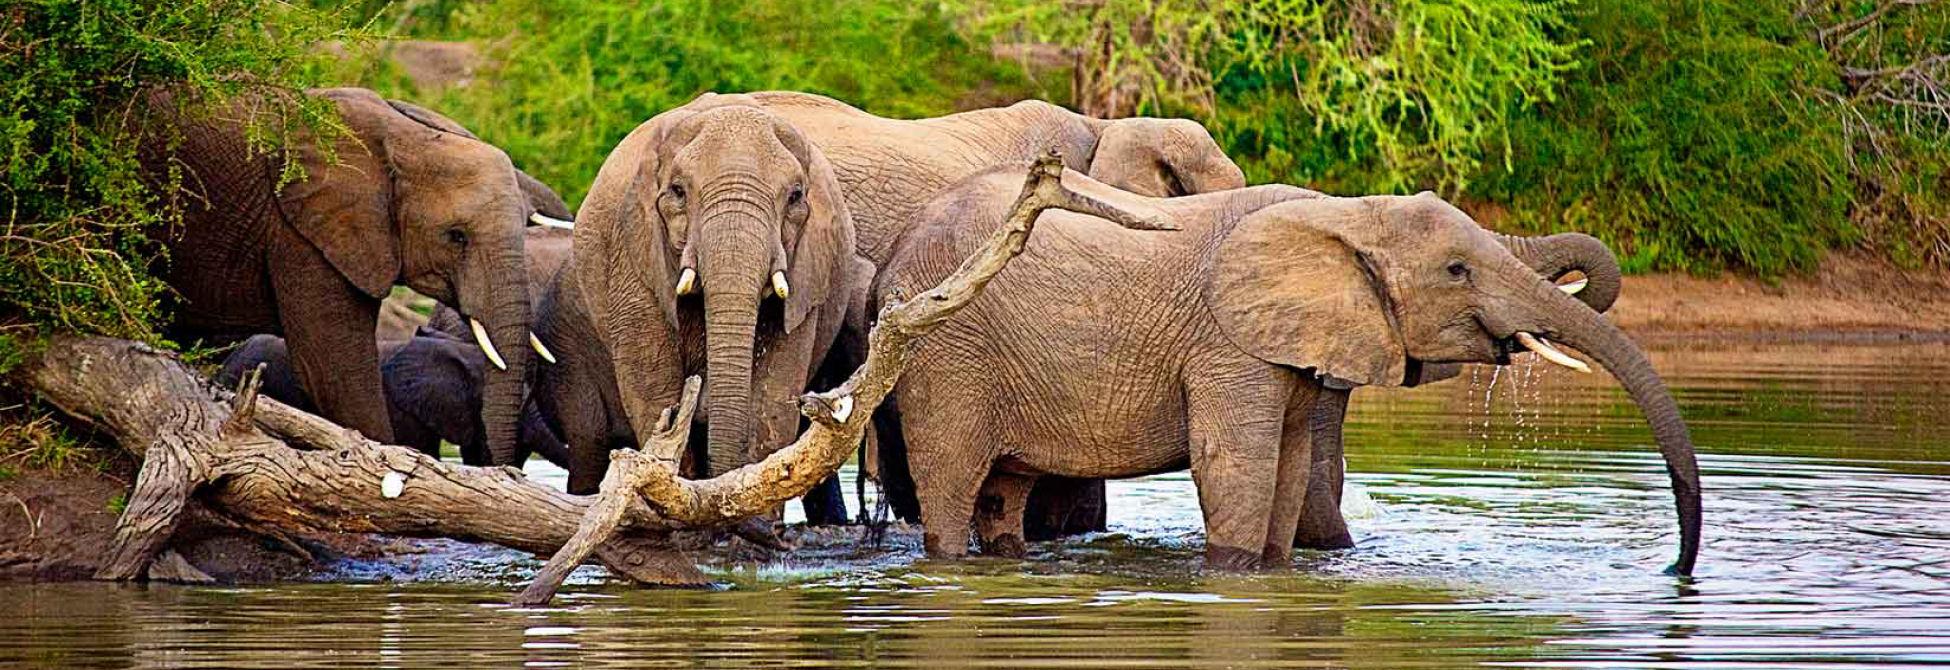 Go Self-Drive Tours South Africa Kruger Park Wildlife